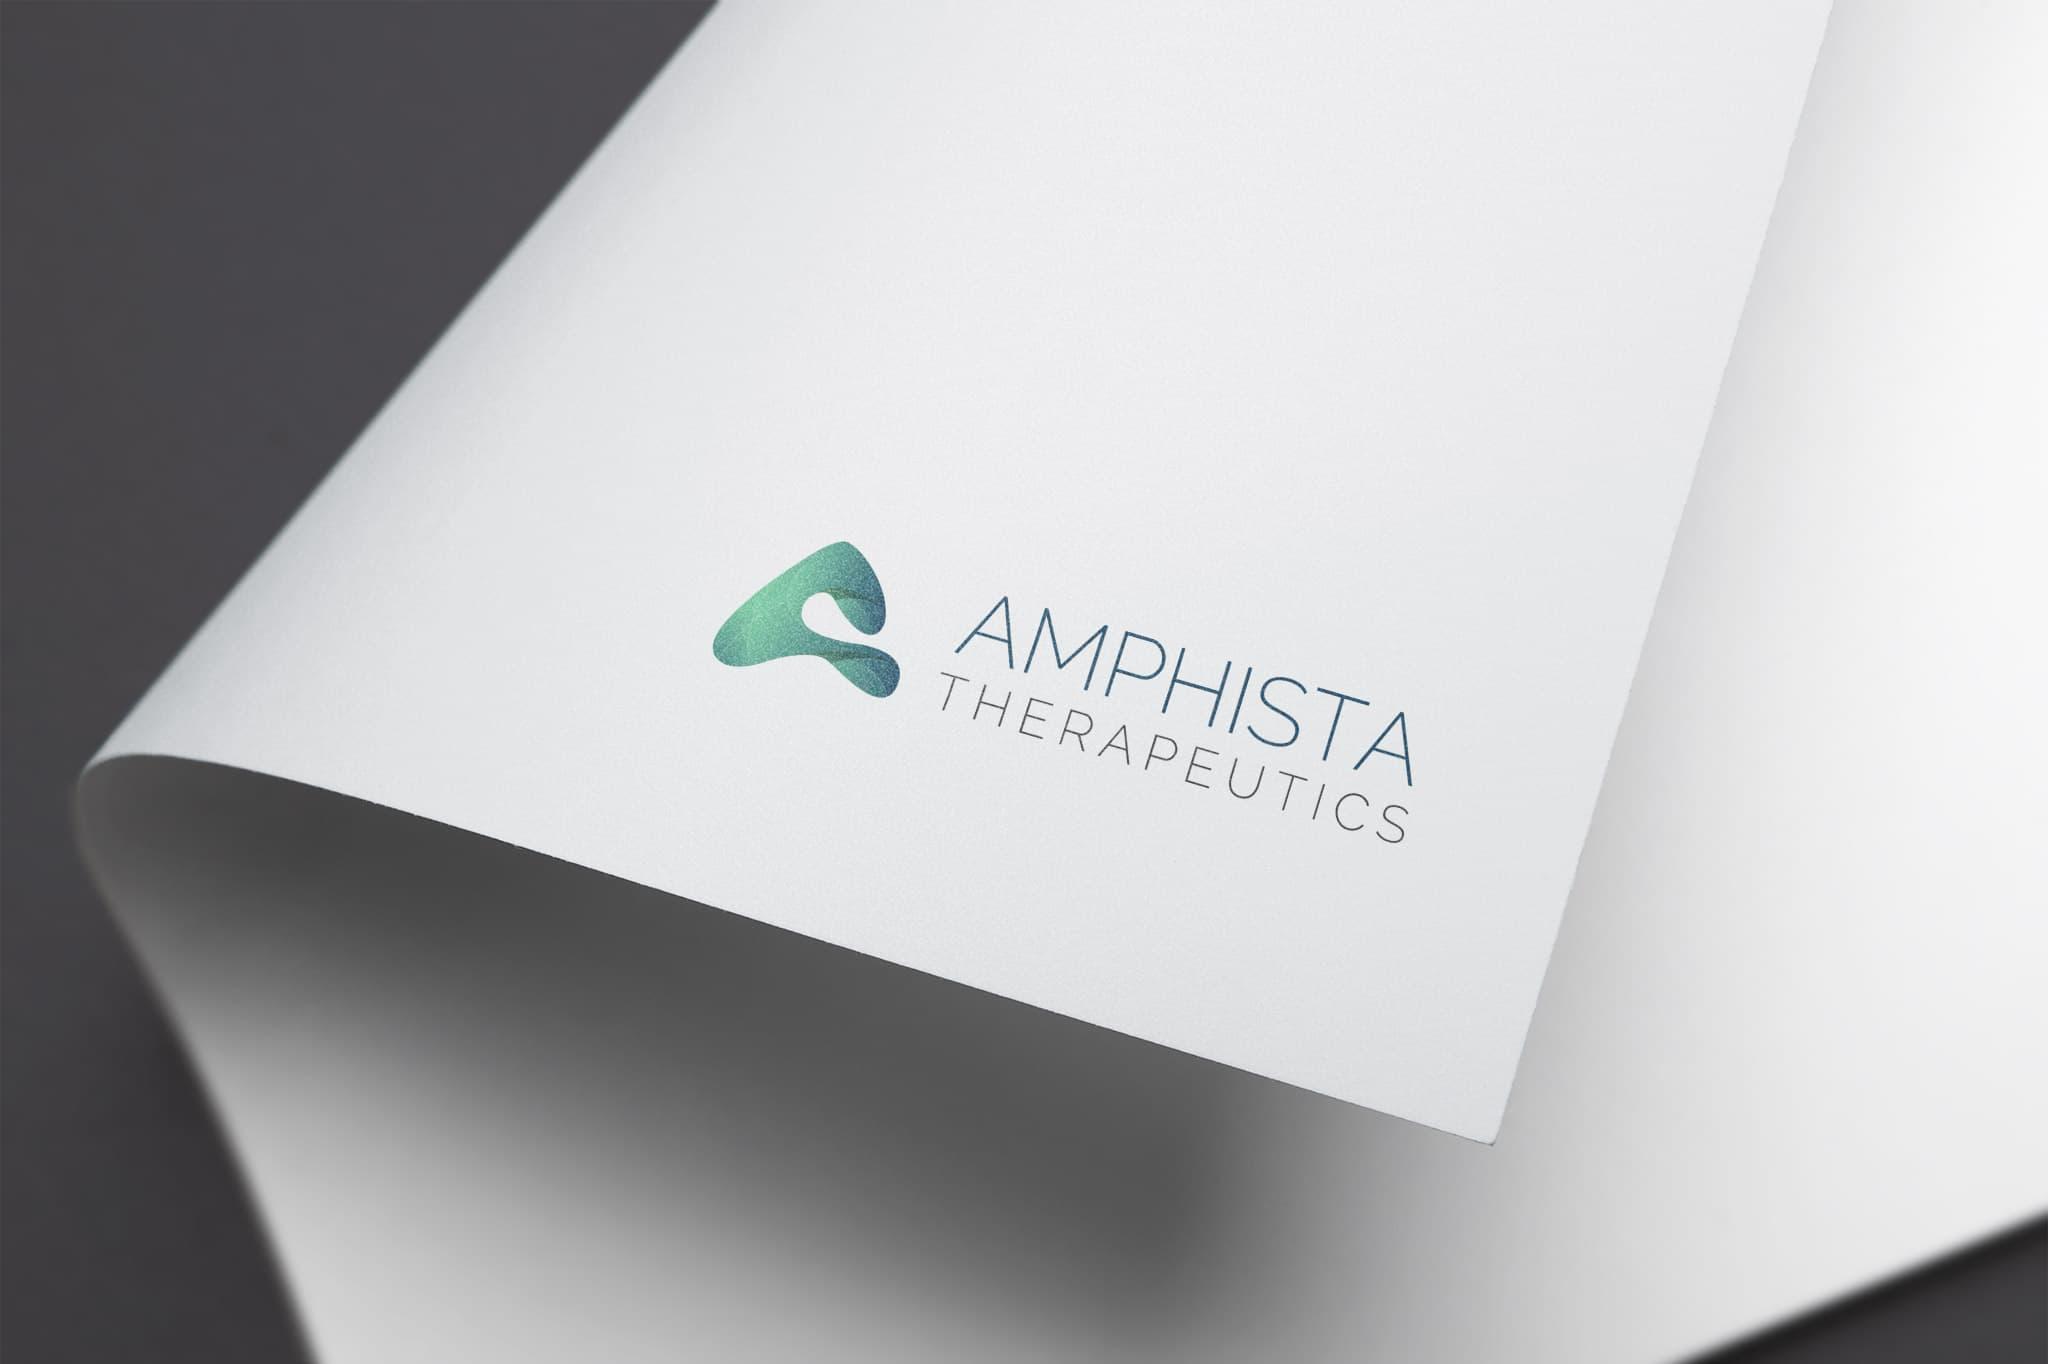 Amphista-1